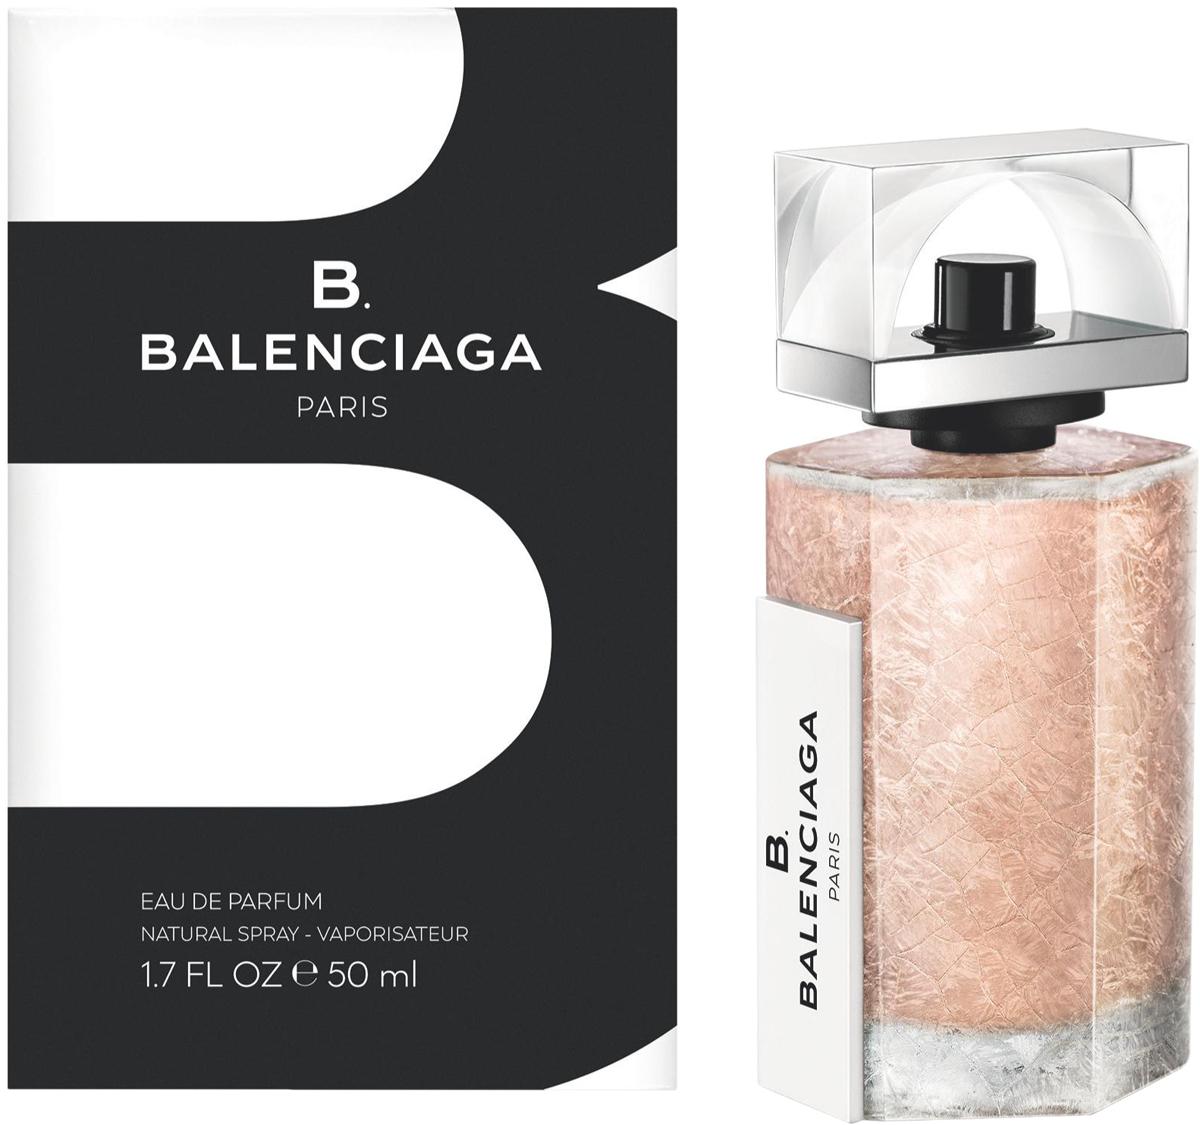 Balenciaga B. Парфюмерная вода женская, 50 мл бумажник balenciaga 253054